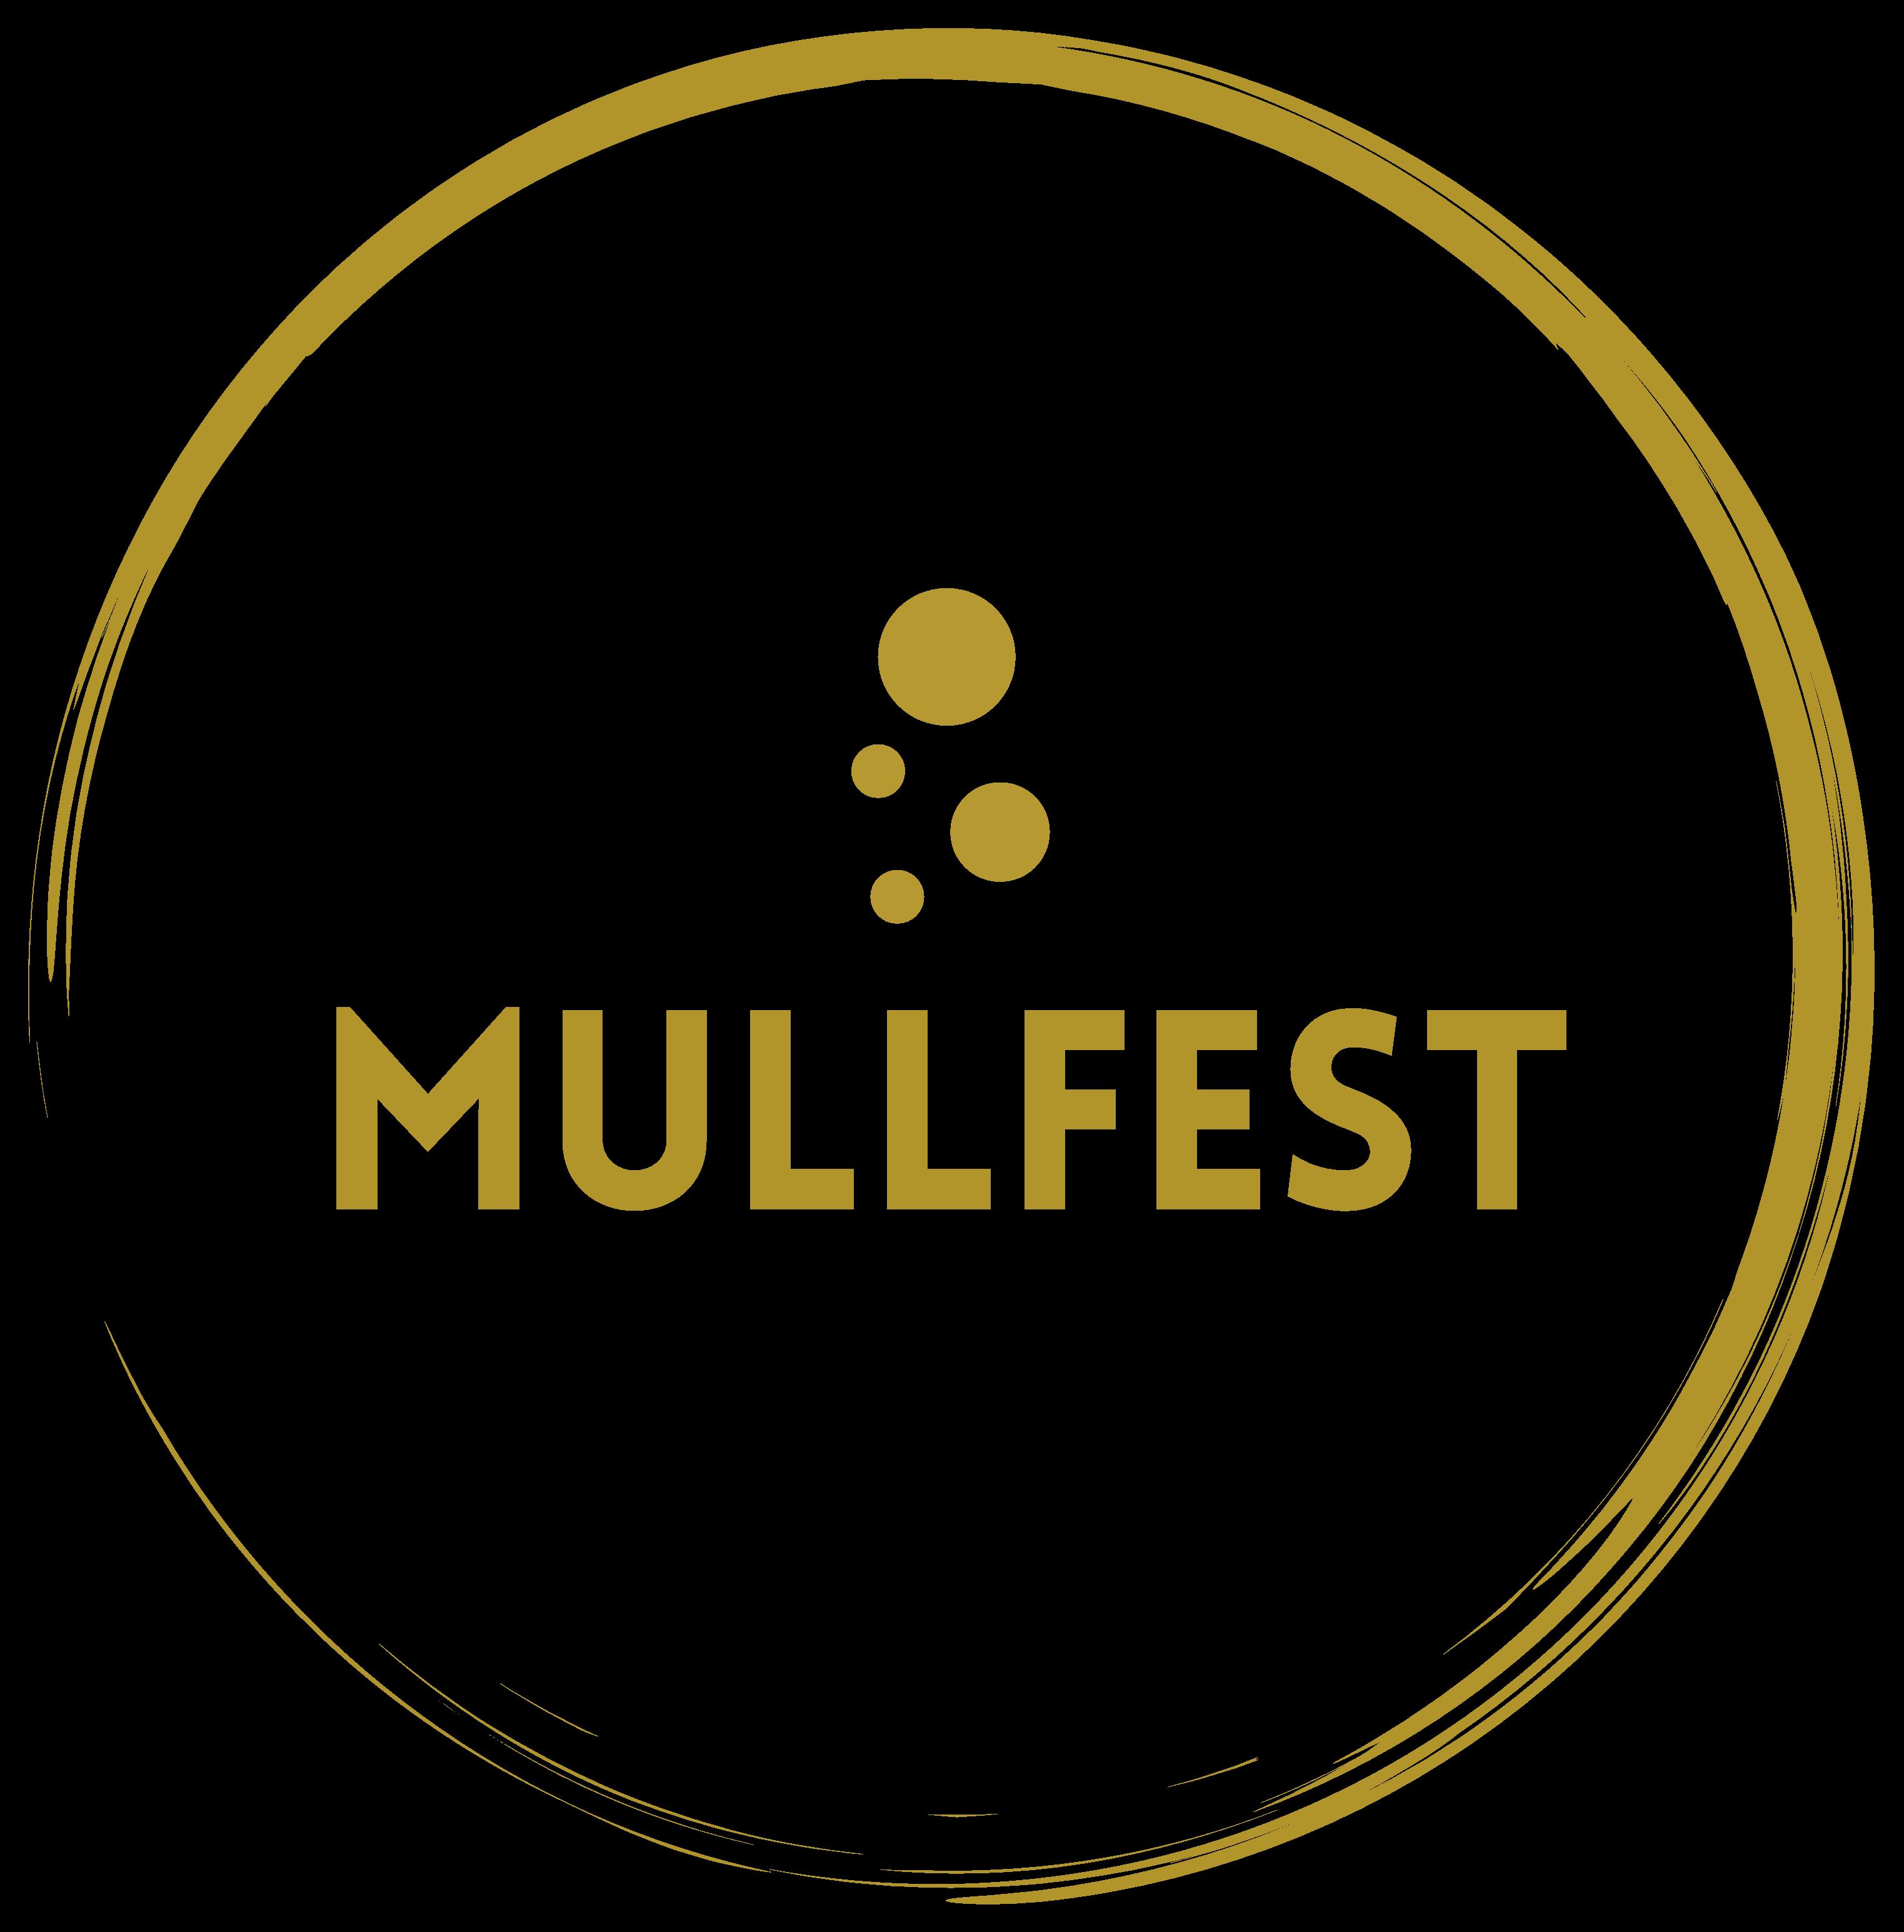 Mullfest